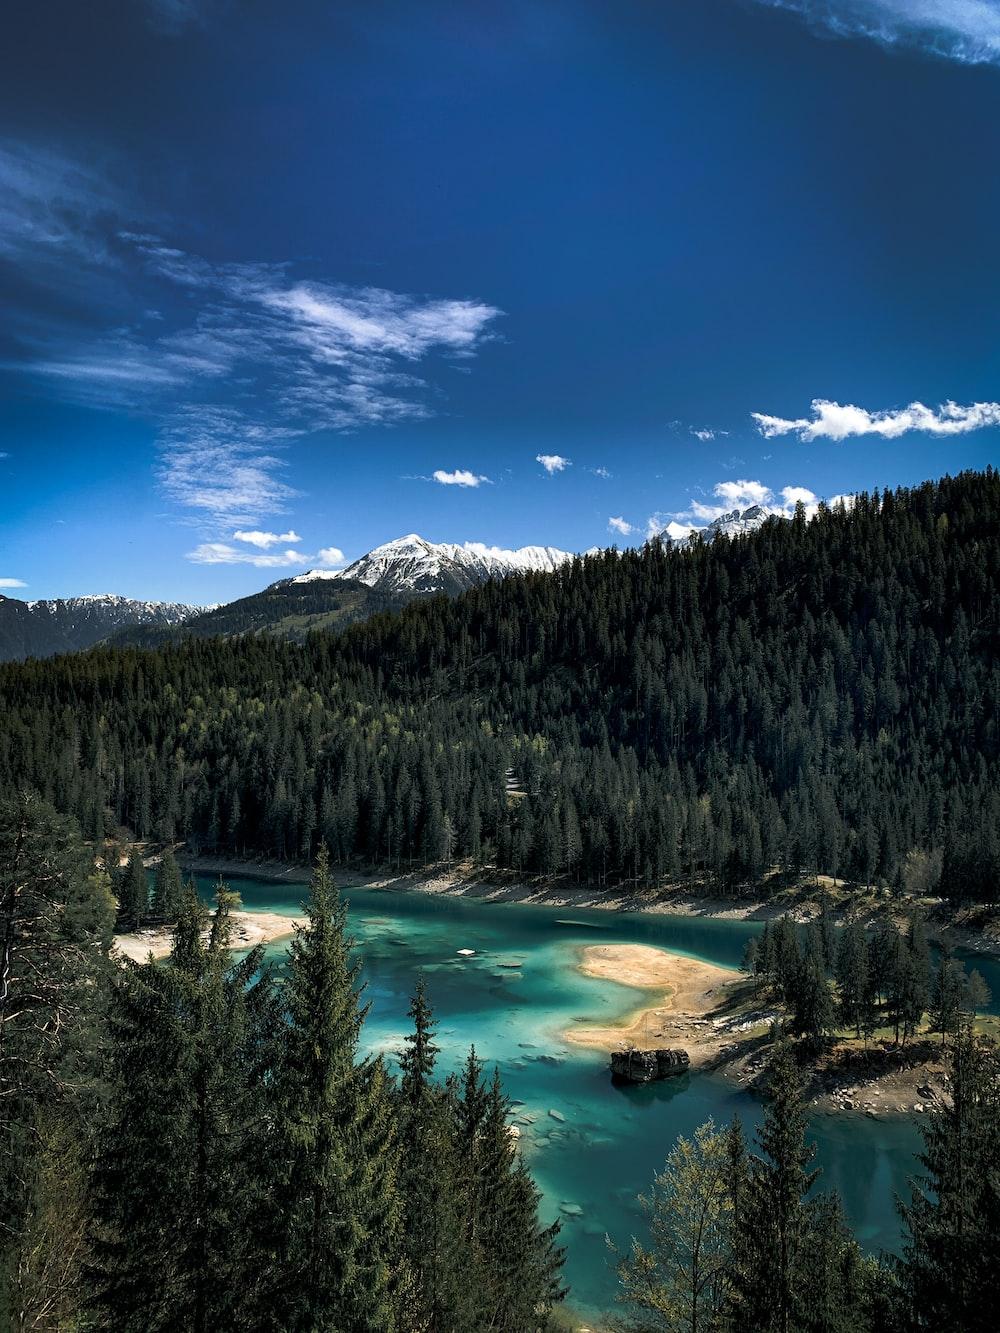 green pine trees near lake under blue sky during daytime